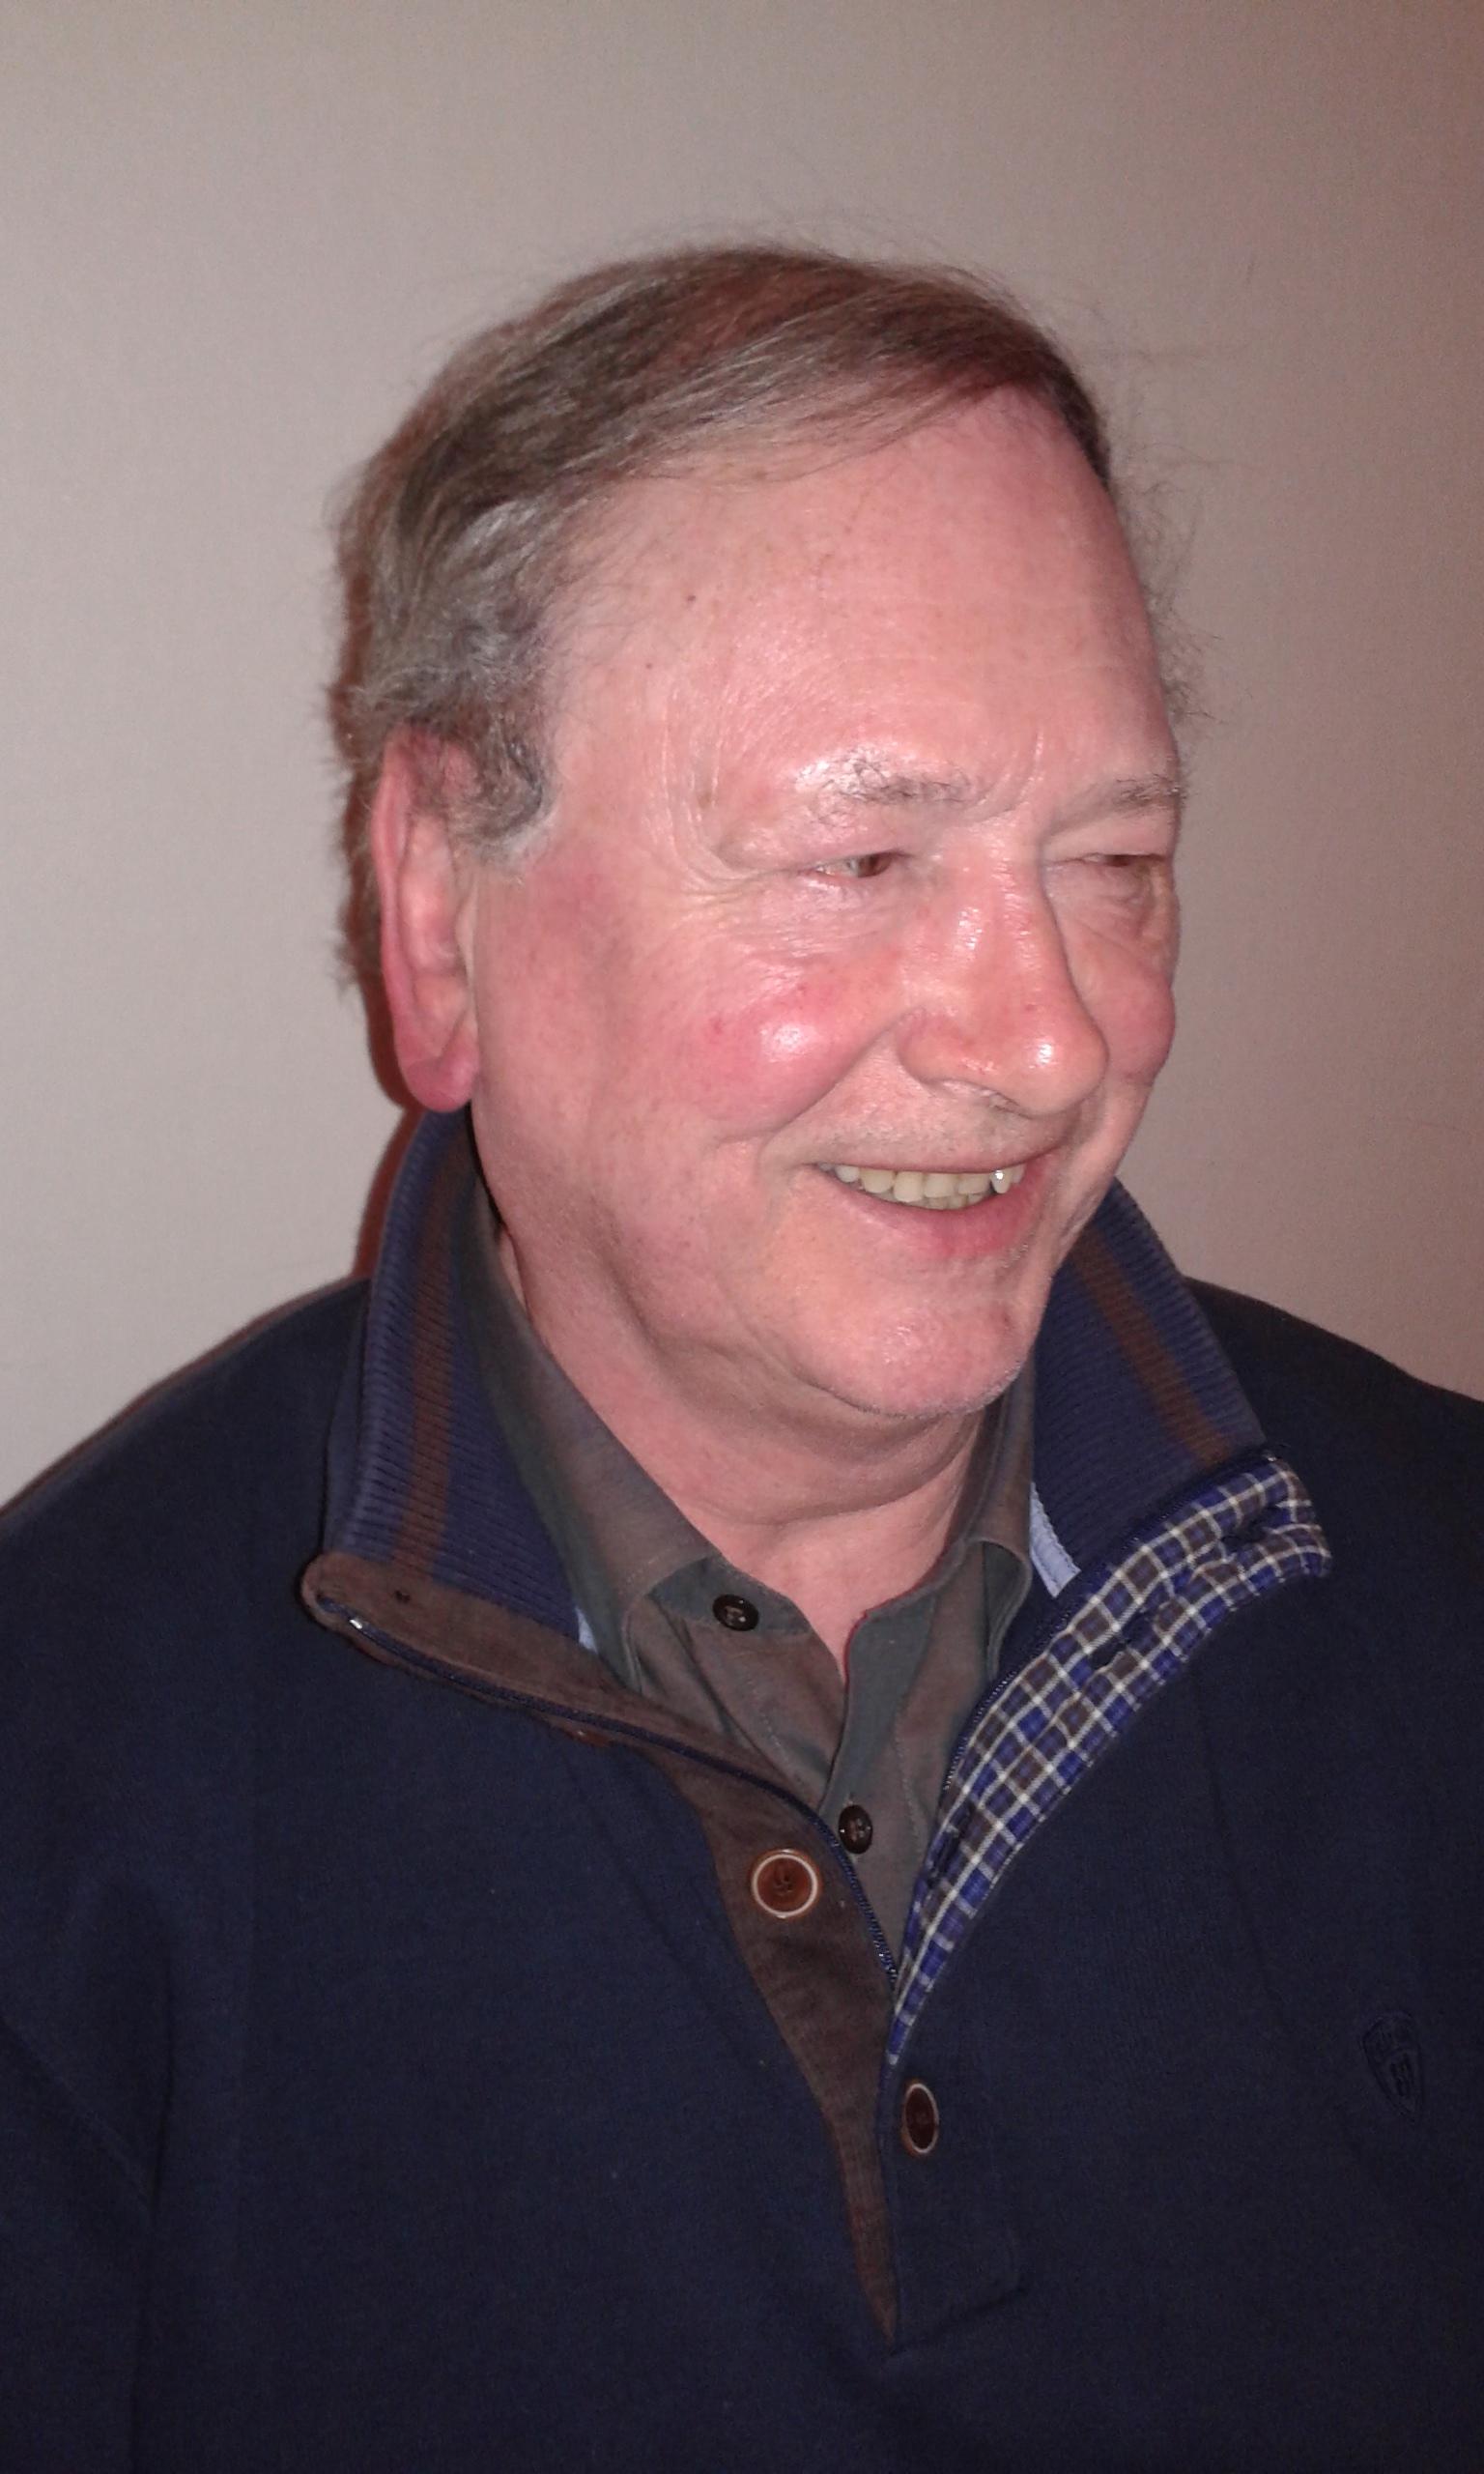 Alain Surget